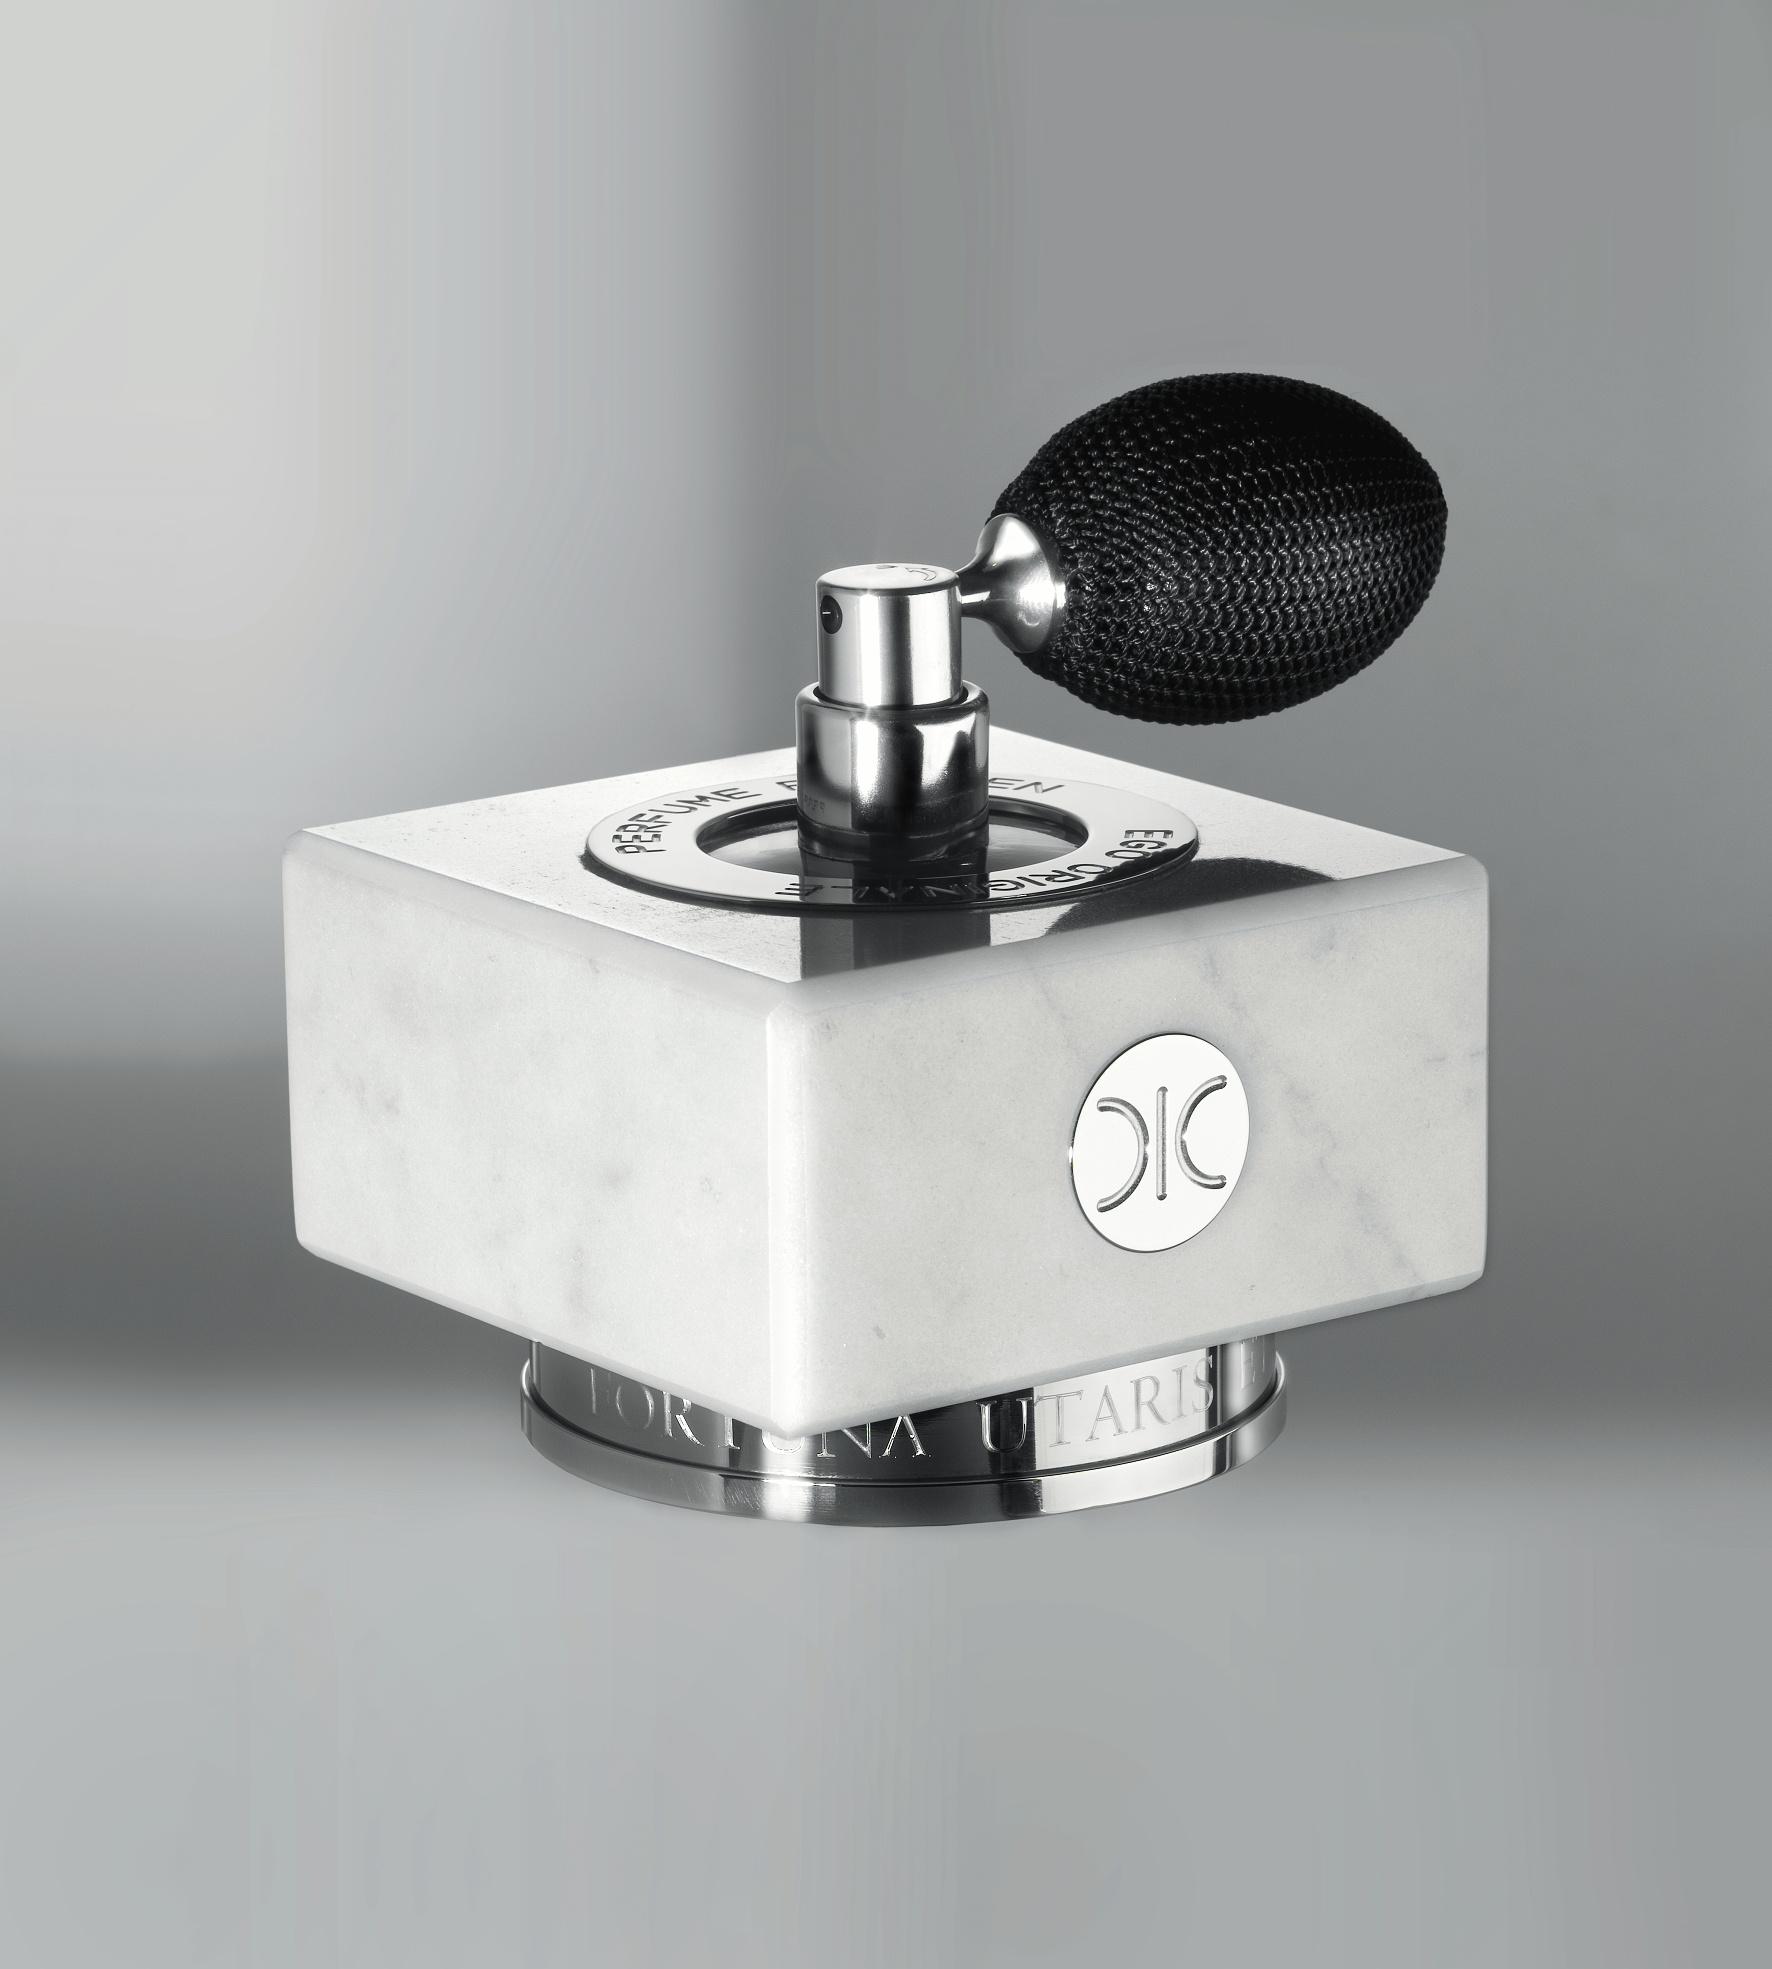 DIC-Parfęm Ego Unicus Luxury Edition of Natural Stone Carrara White